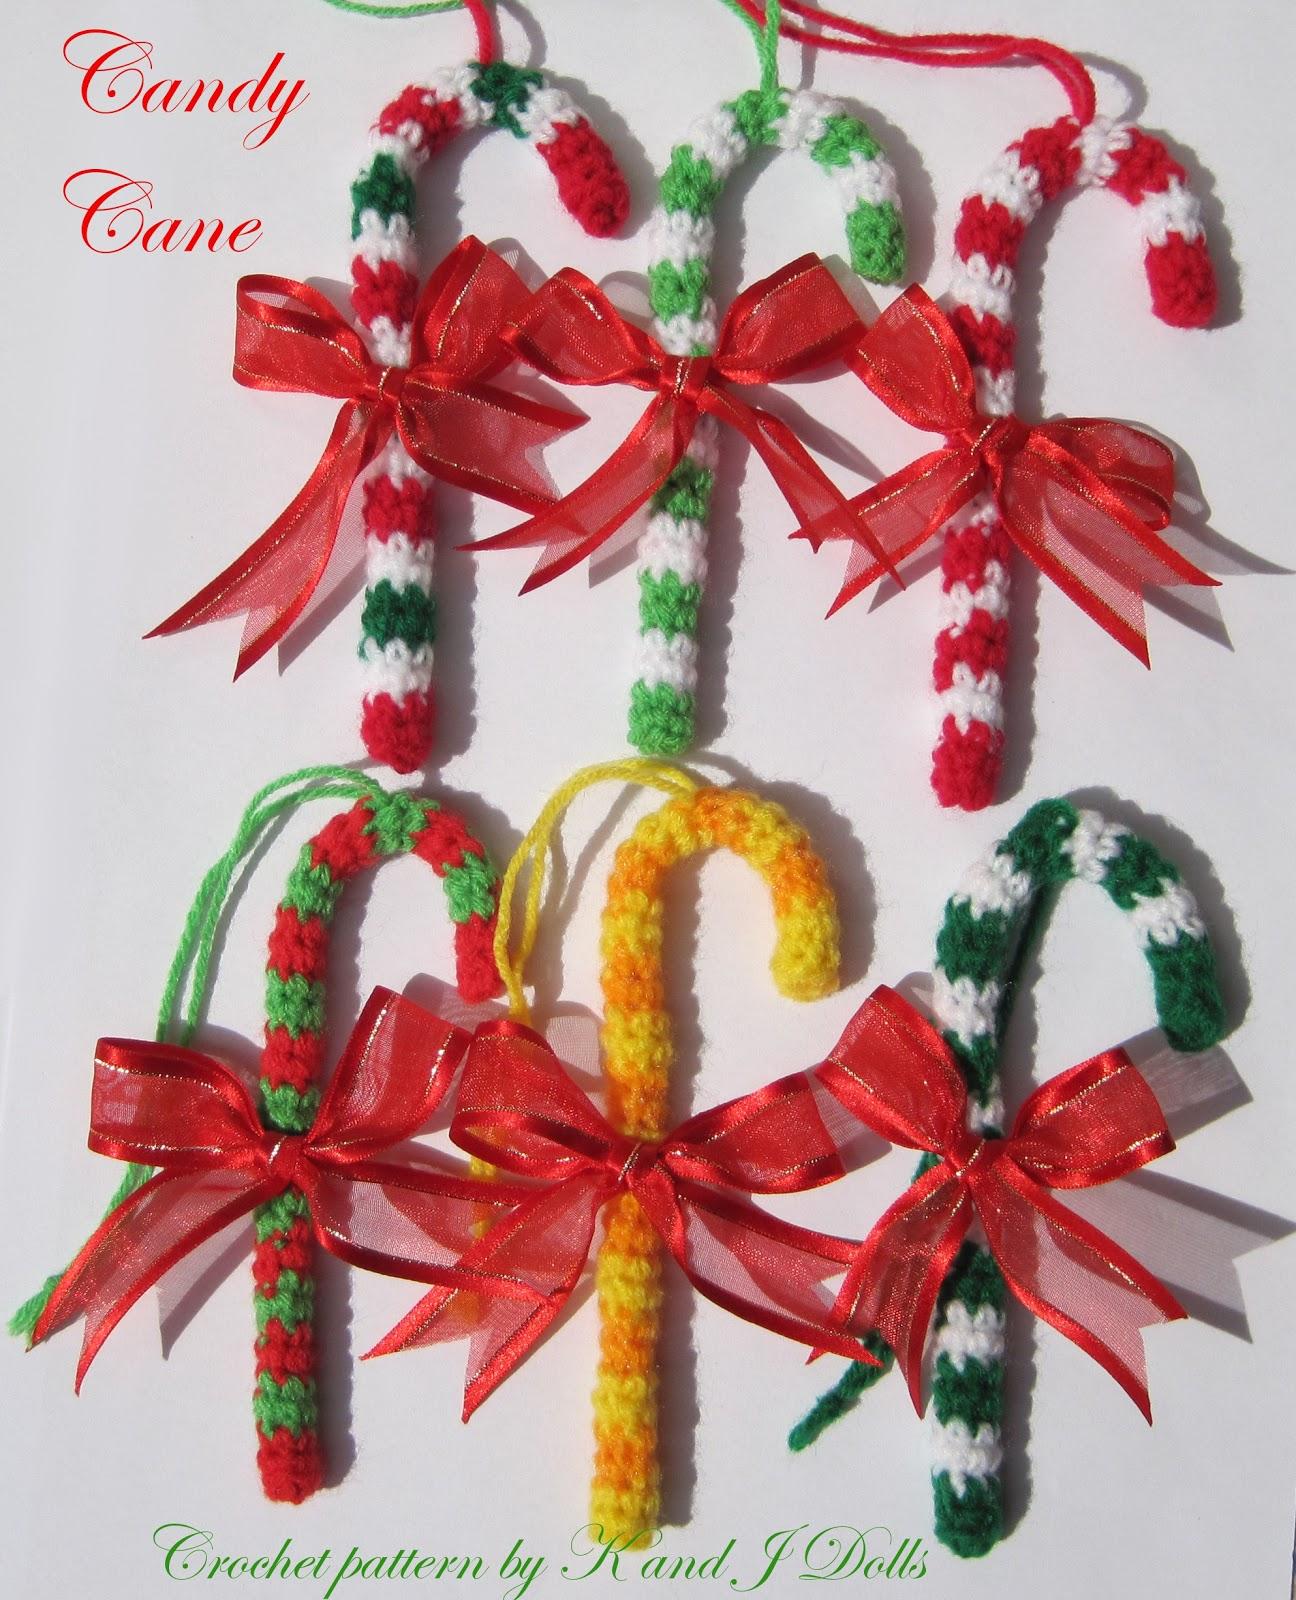 Amigurumi Christmas Decorations : Christmas ornaments crochet pattern - Sayjai Amigurumi ...